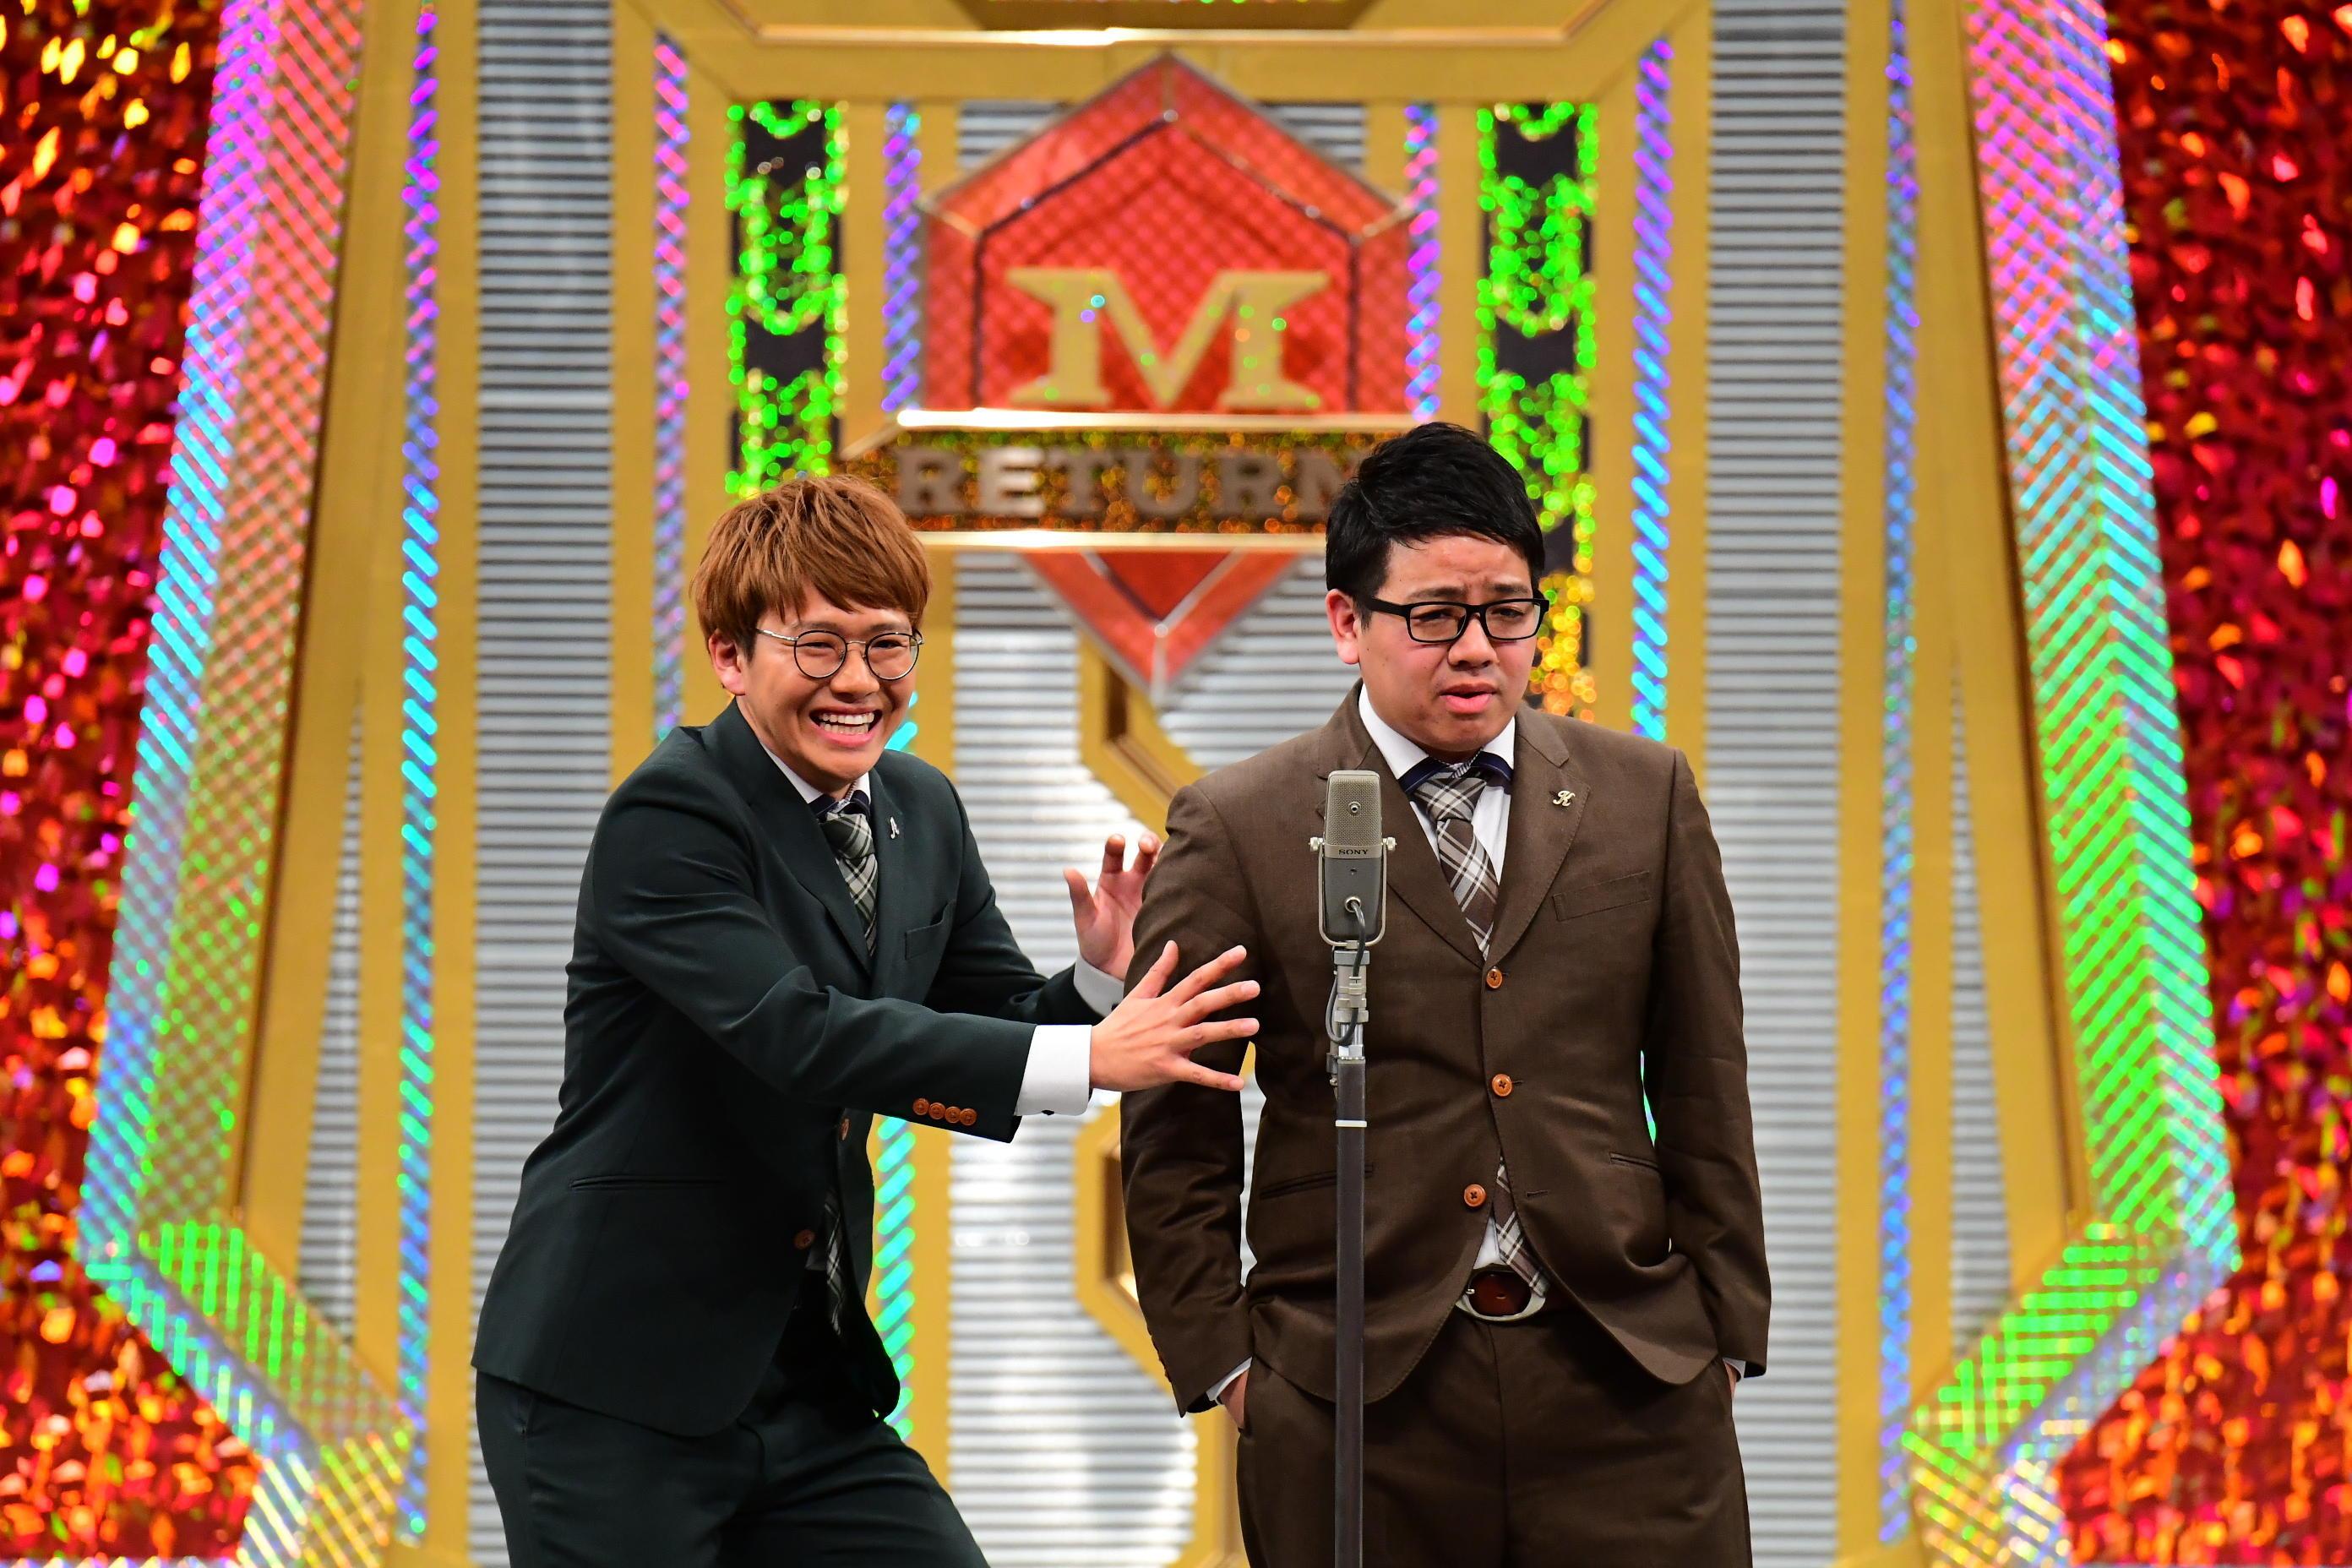 http://news.yoshimoto.co.jp/20170228155435-4f9369fea5594b4859a141b80f890852b611920f.jpg